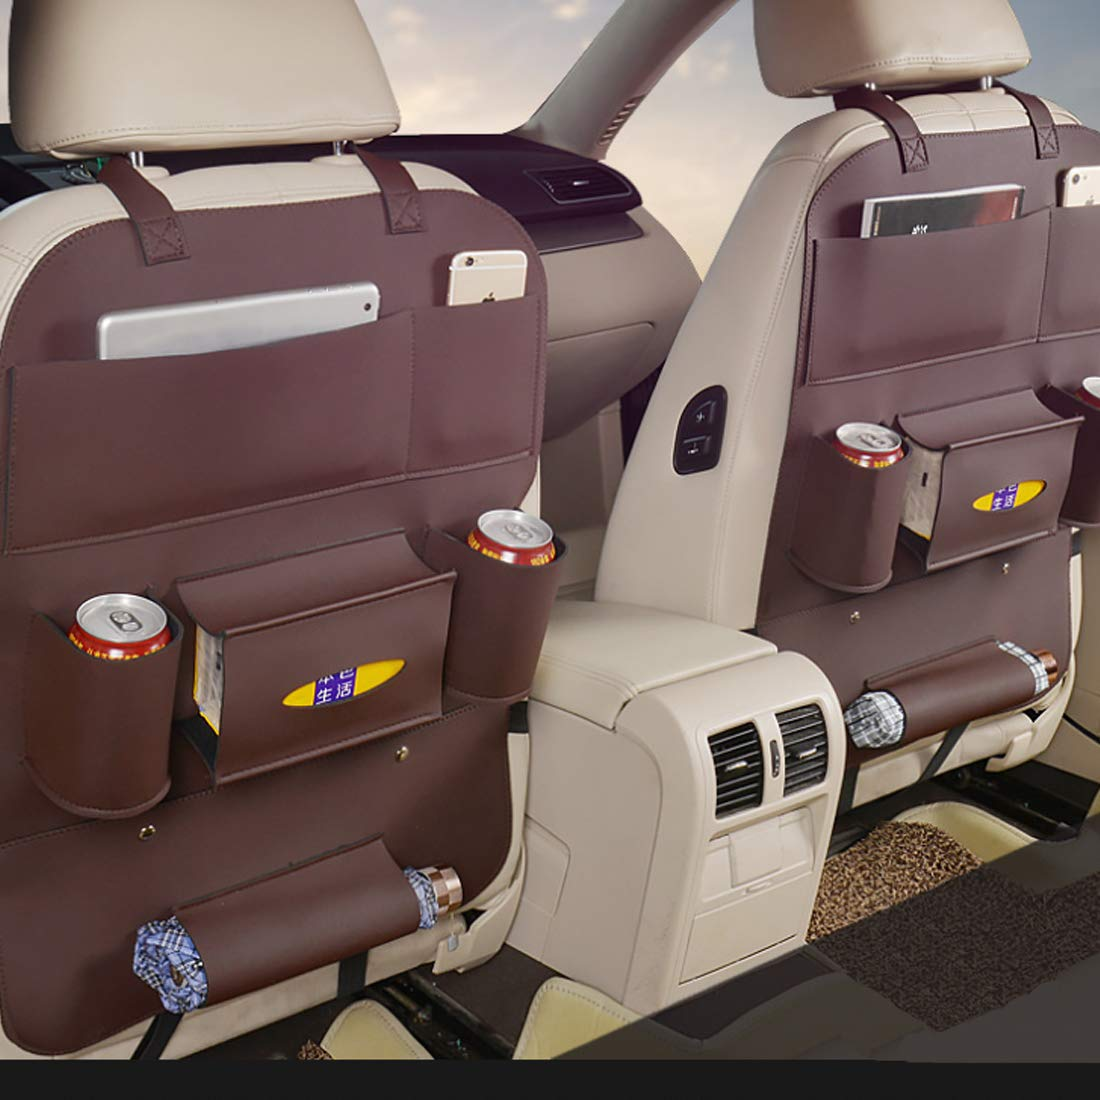 Car Back seat Organizer Protector,Universal use as car Backseat Organizer for Kids,Storage Bottles,Tissue Box,Toys-A